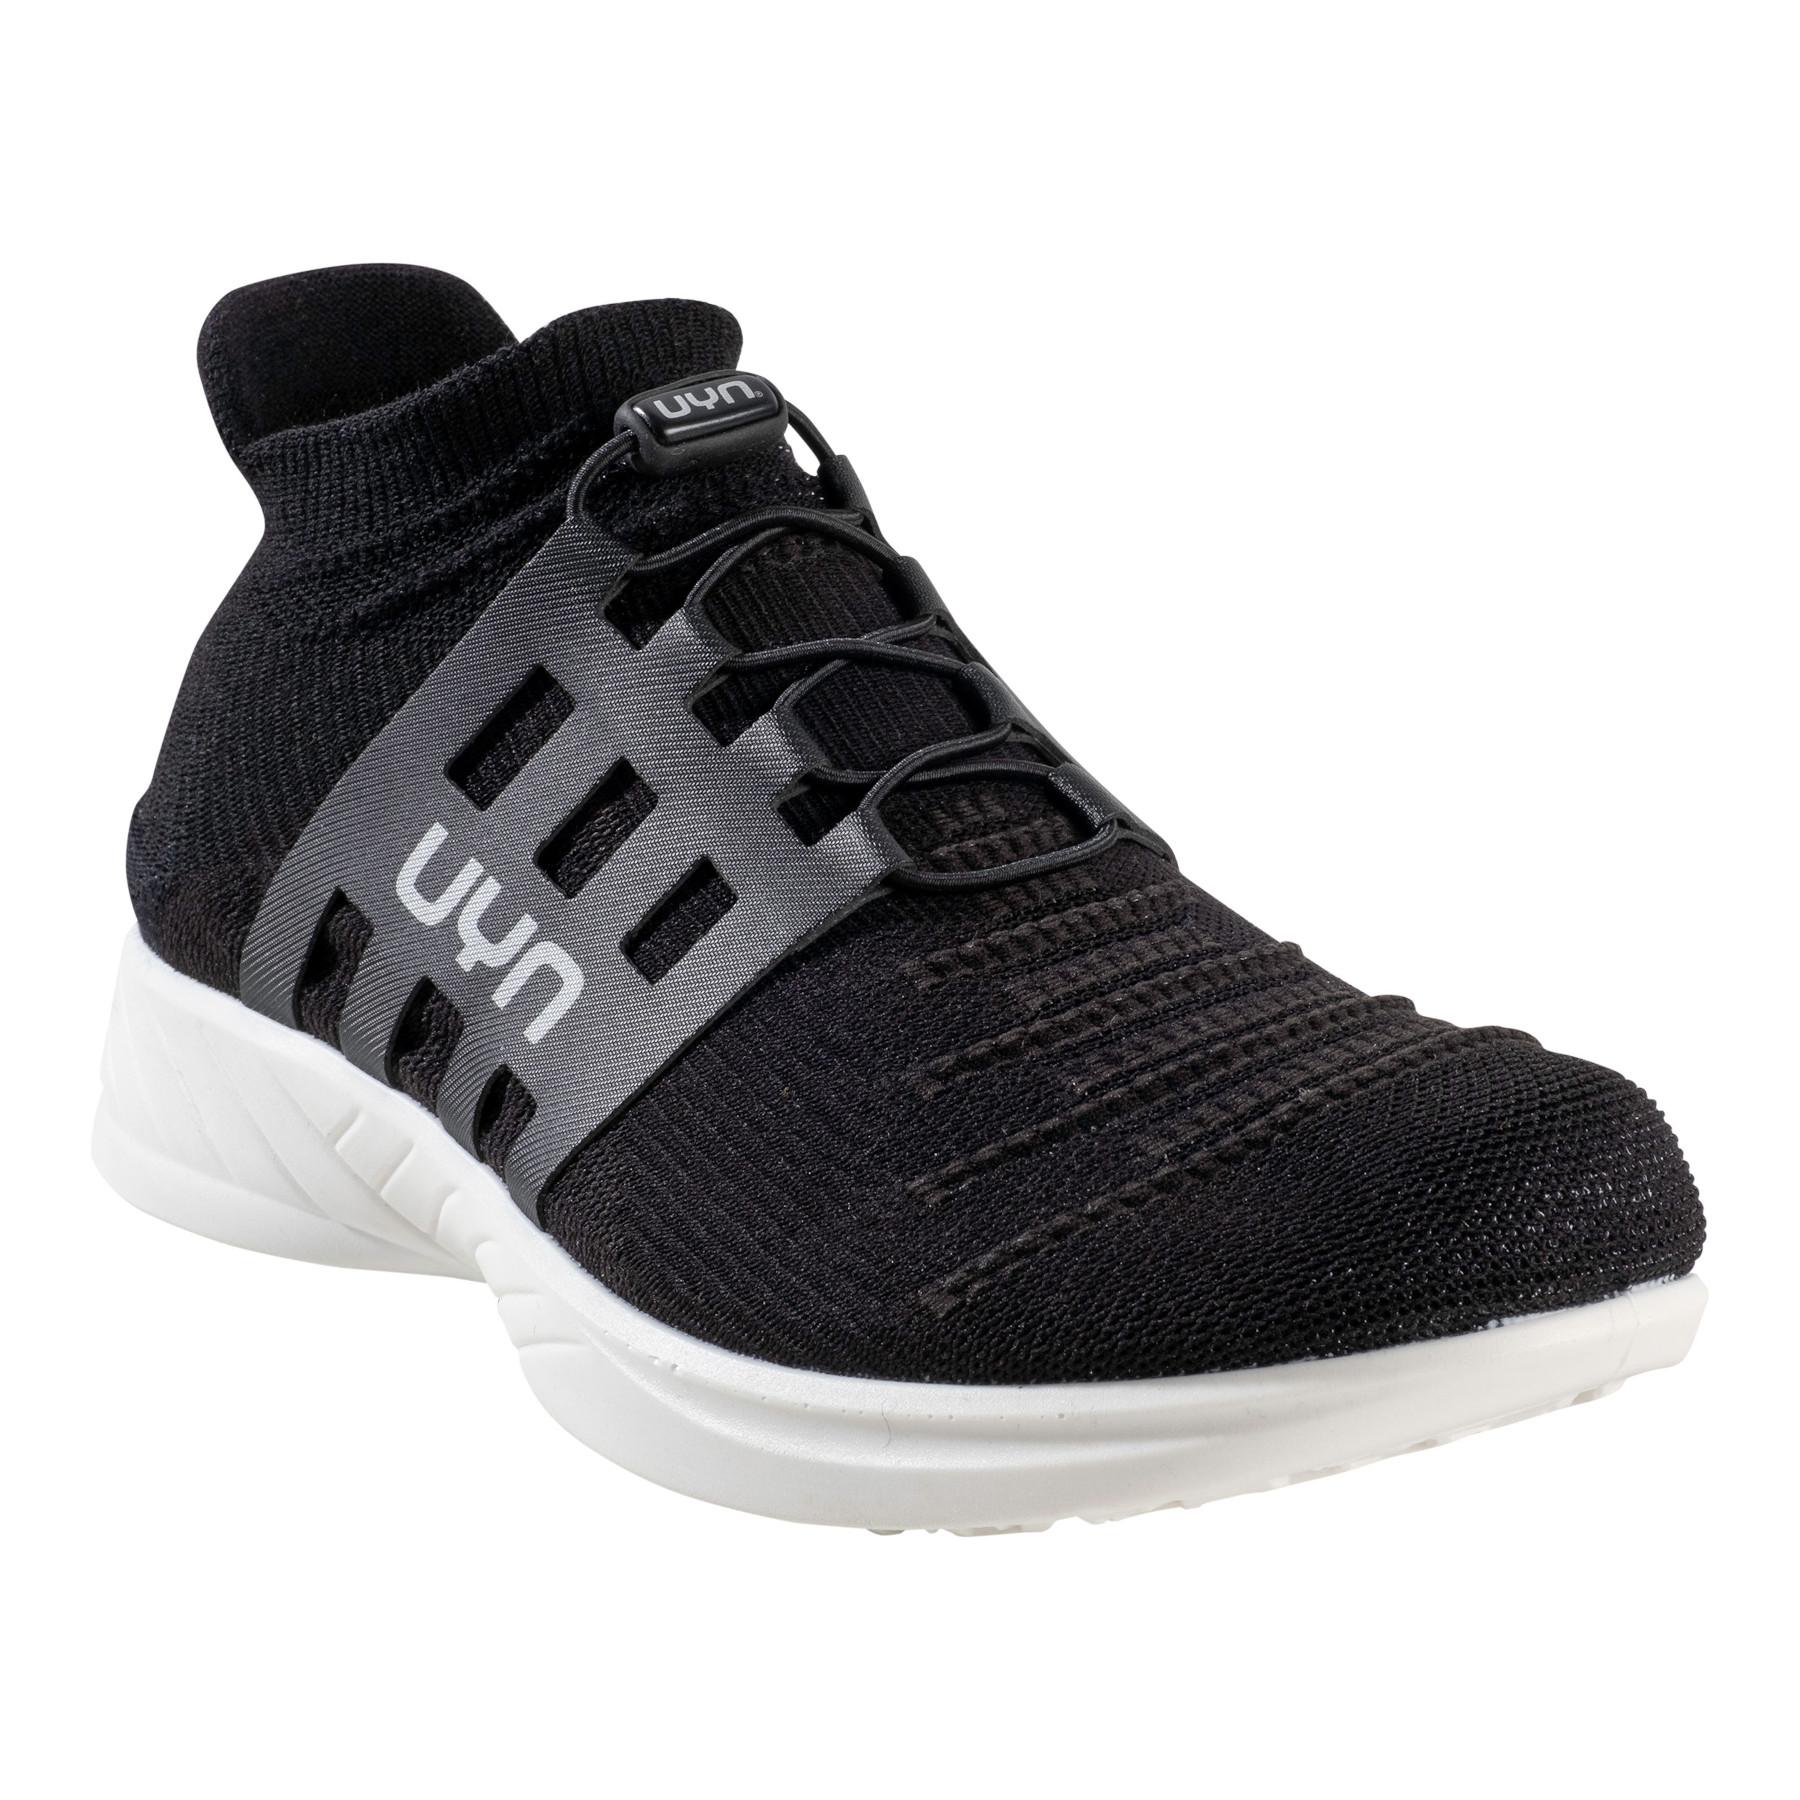 UYN X-Cross Tune Lady Running Shoes - Optical Black/Black